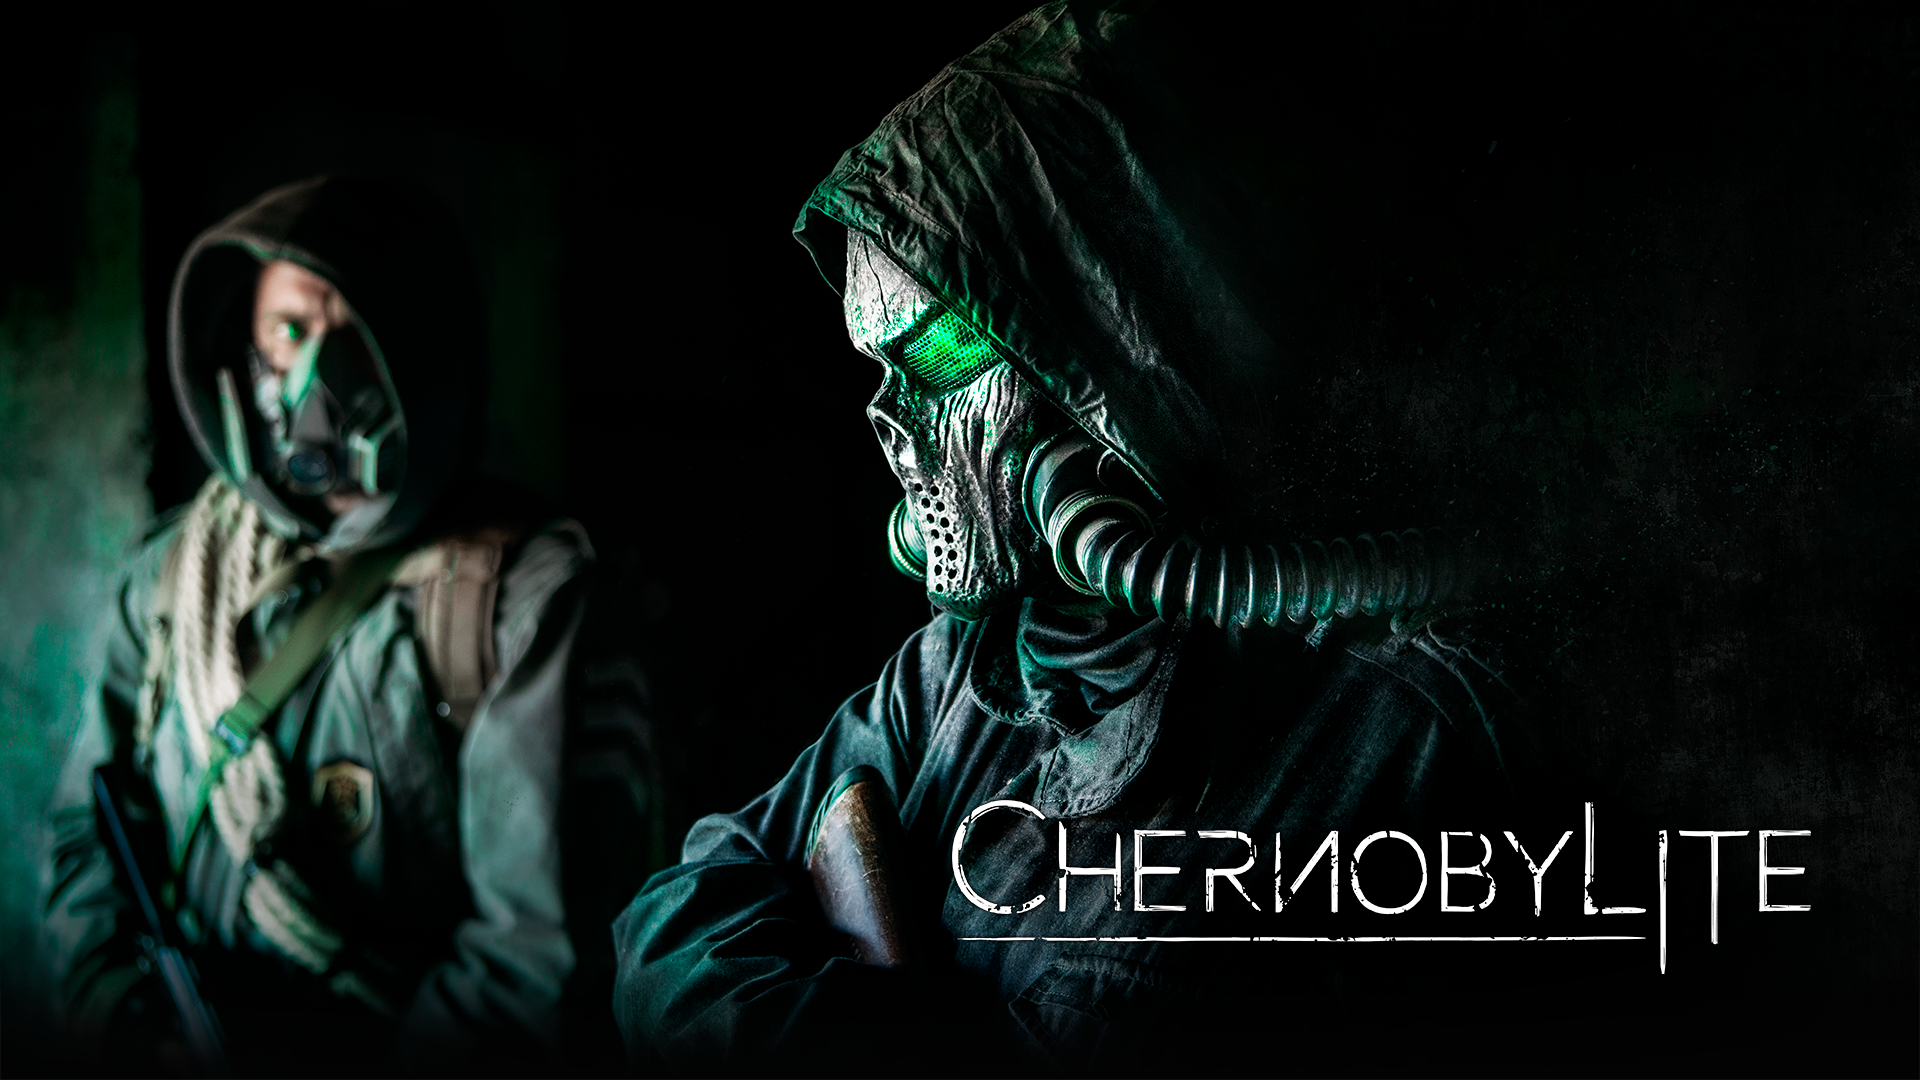 Chernobylite earlyaccesspreview bg